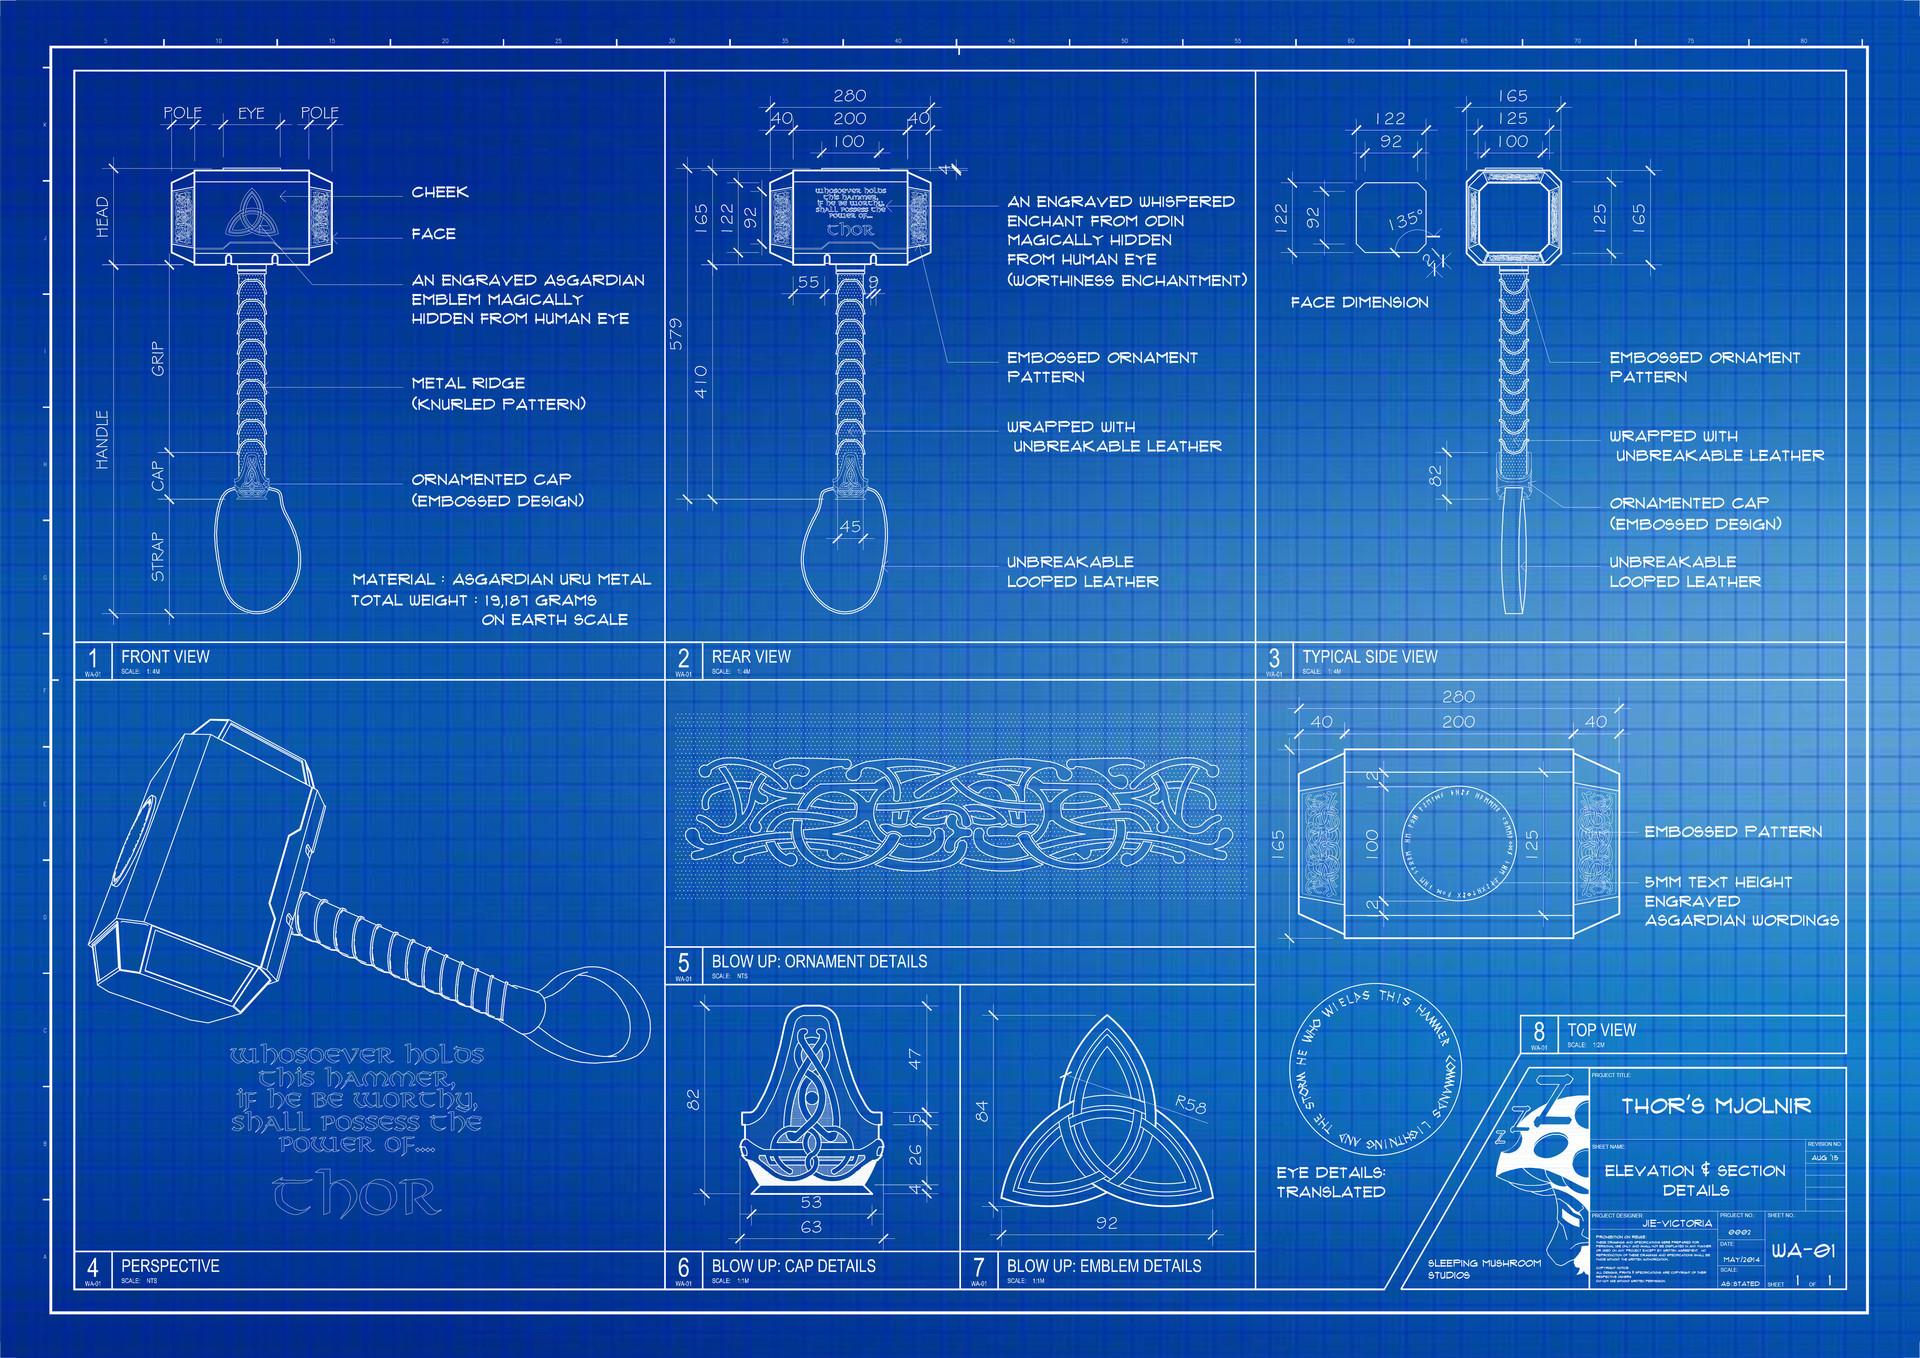 Voltes V Wallpaper Hd Artstation Thor S Mjolnir Blueprint Jie Victoria